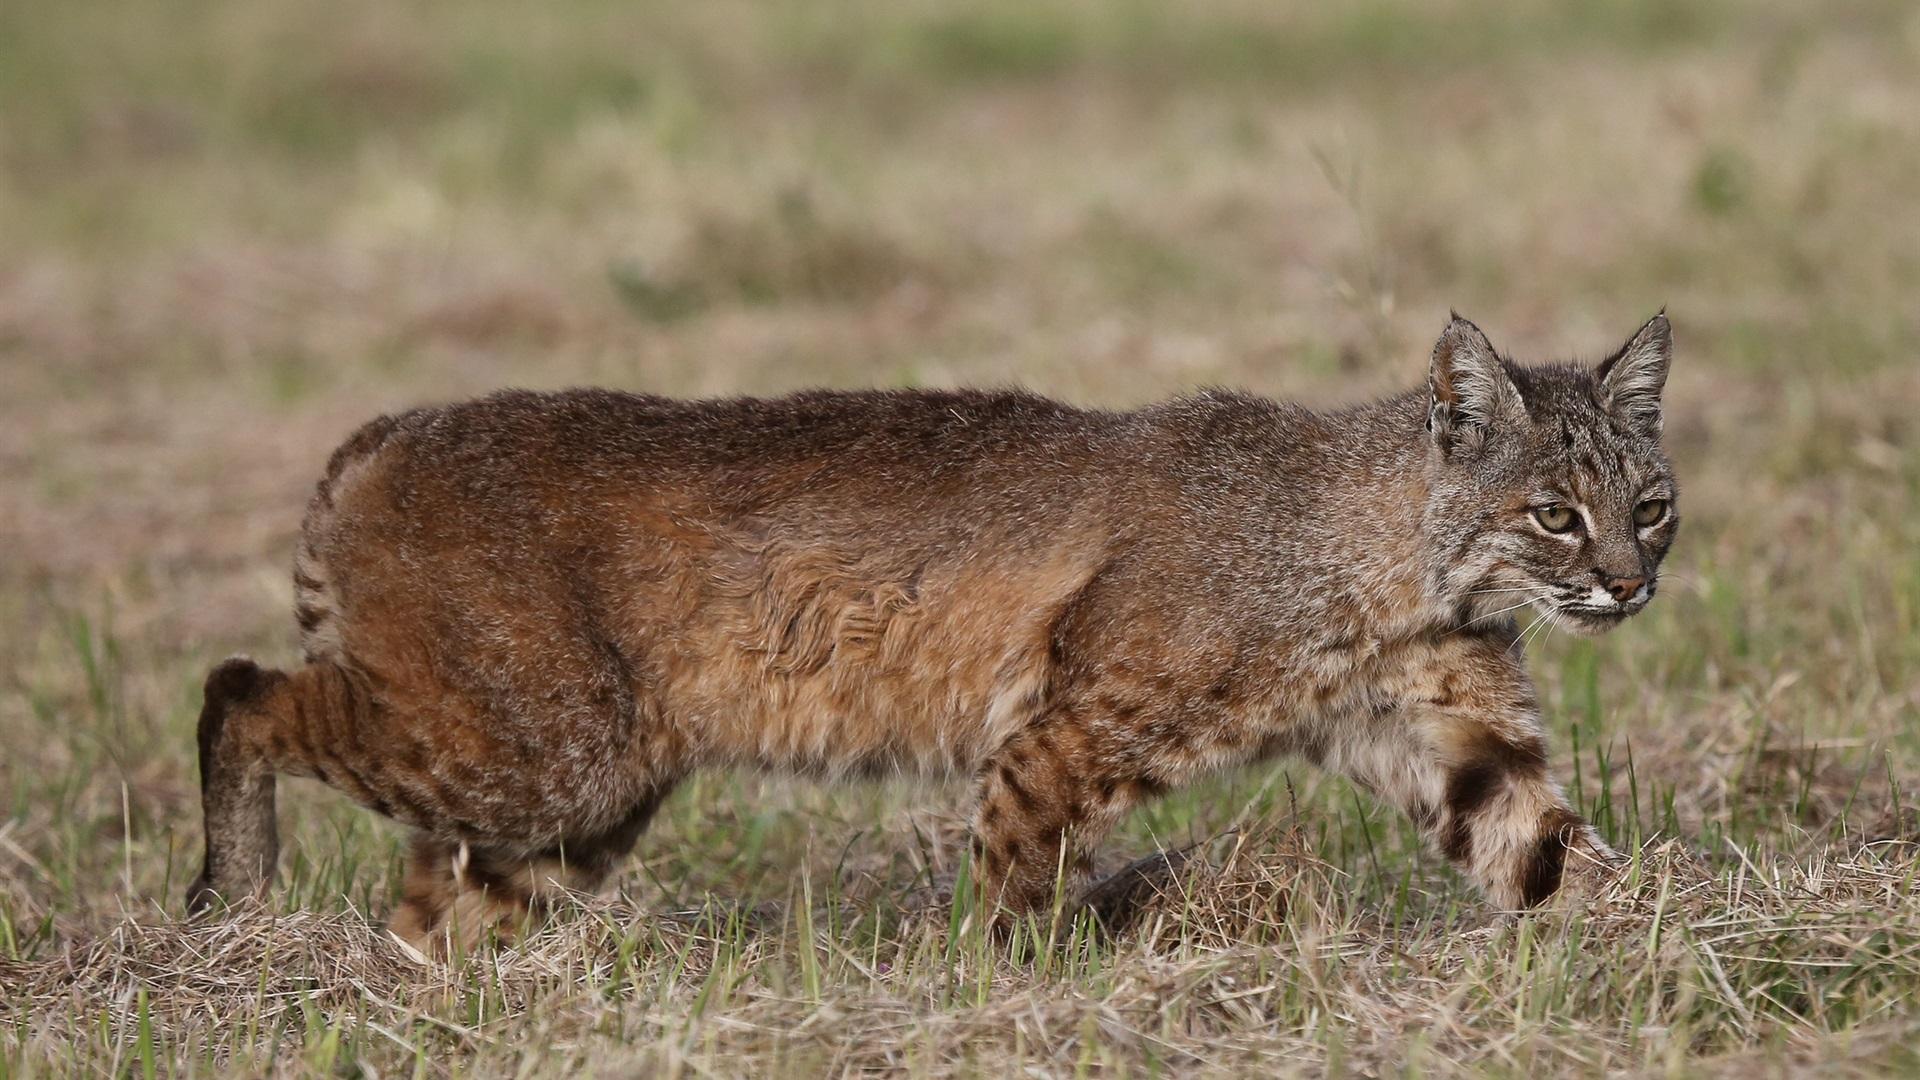 Wild cat, lynx, predator, hunting Wallpaper | 1920x1080 ...